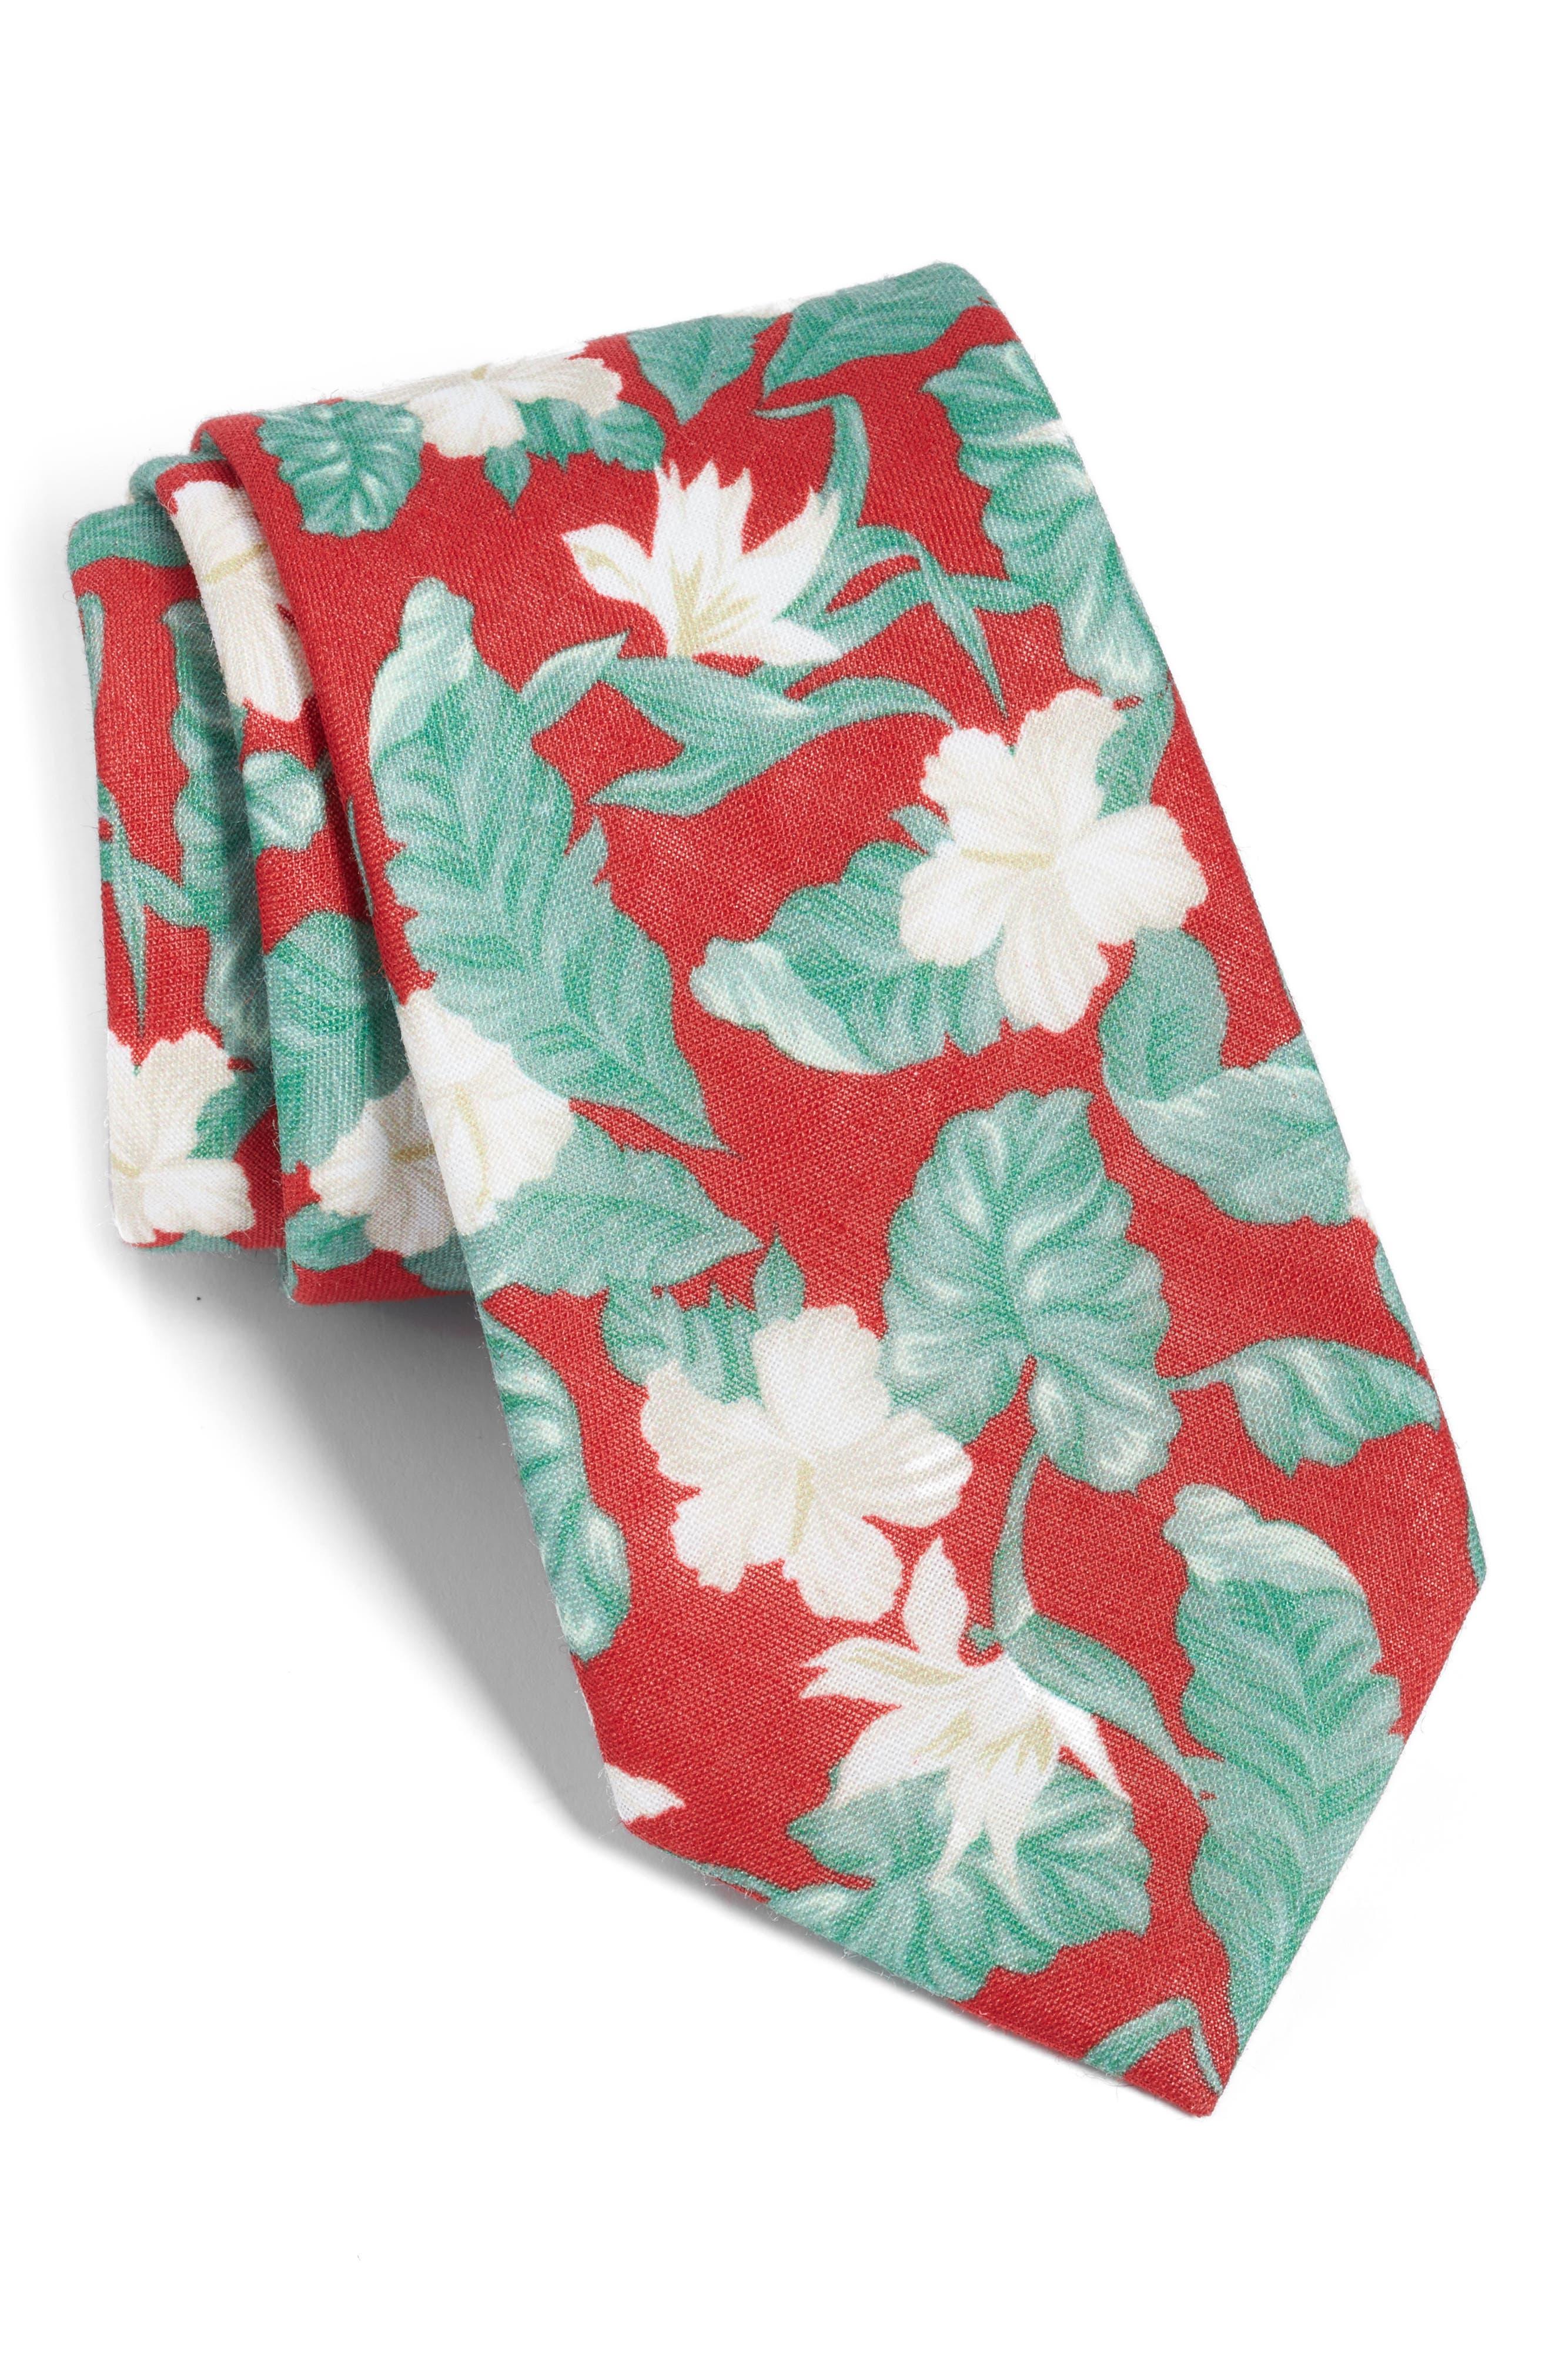 Floral Linen Tie,                             Main thumbnail 1, color,                             RED